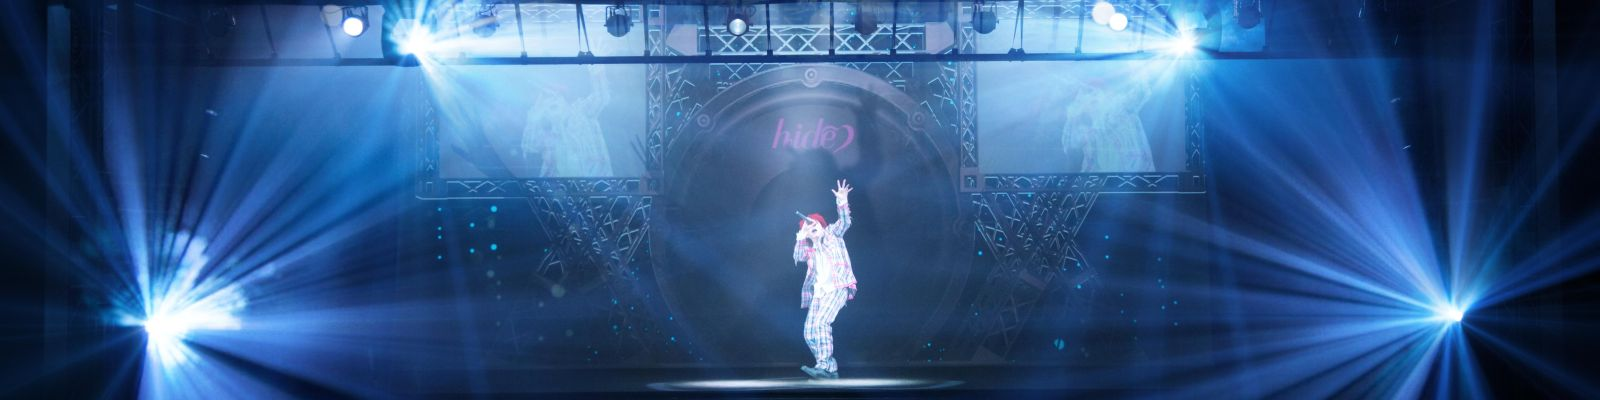 20150814-hide